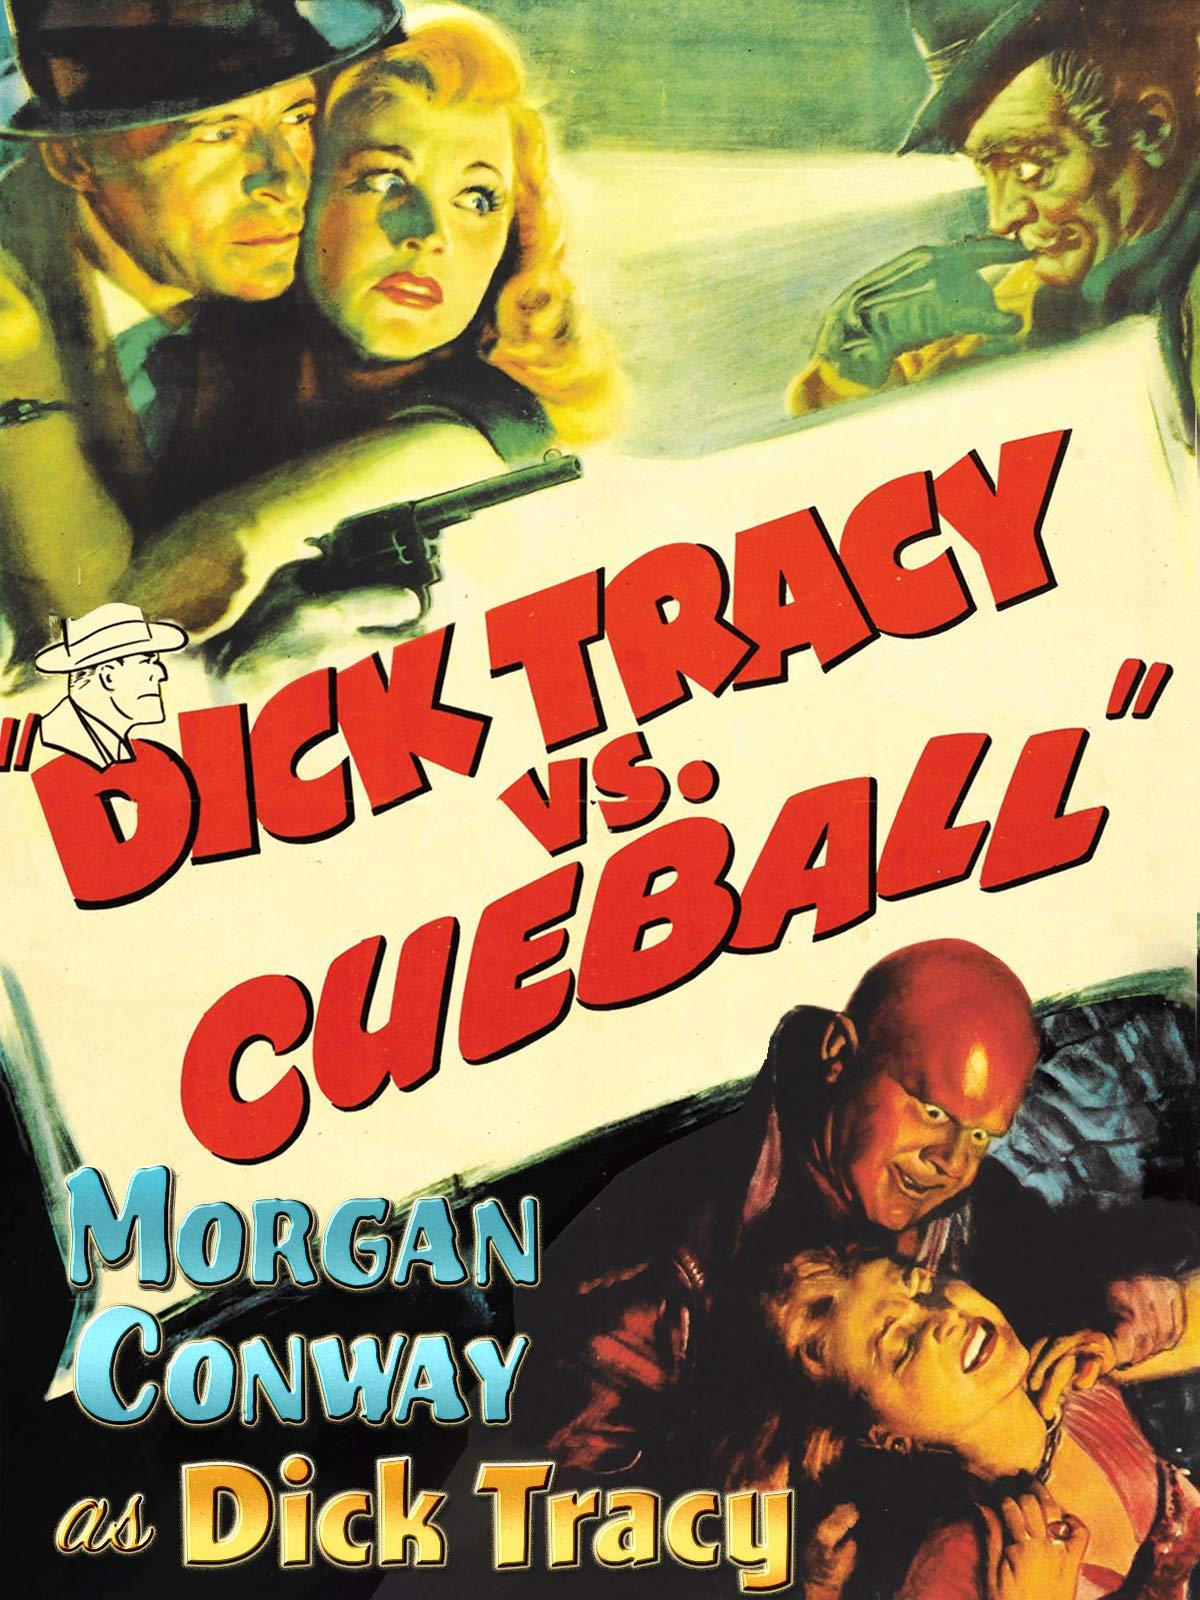 Dick Tracy vs Cueball - Morgan Conway As Dick Tracy